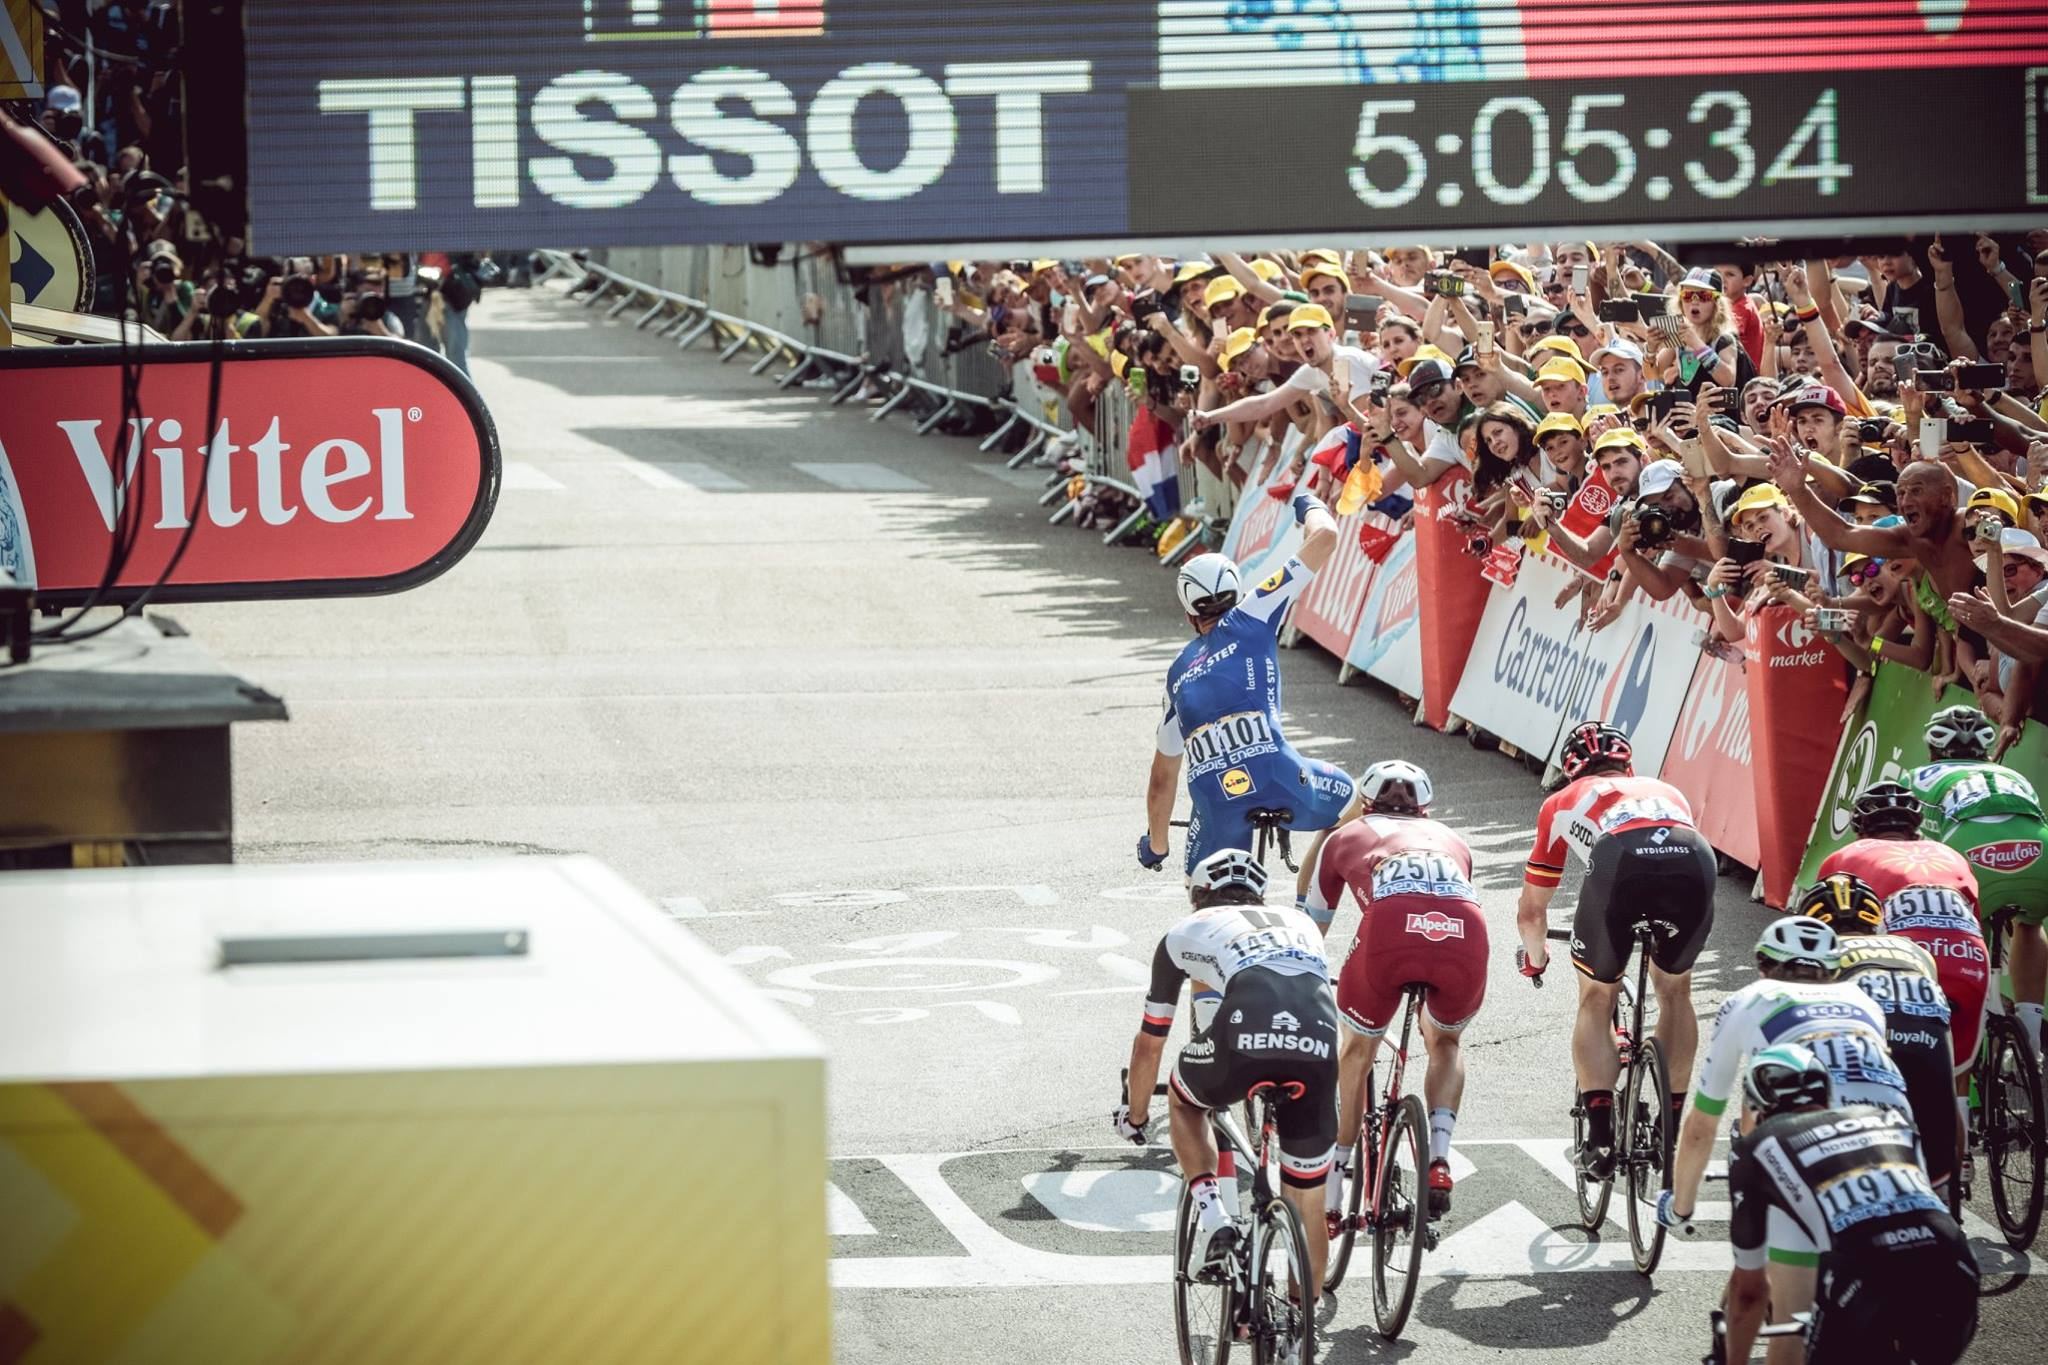 Marcel Kittel trece victorios linia de finish in etapa 6